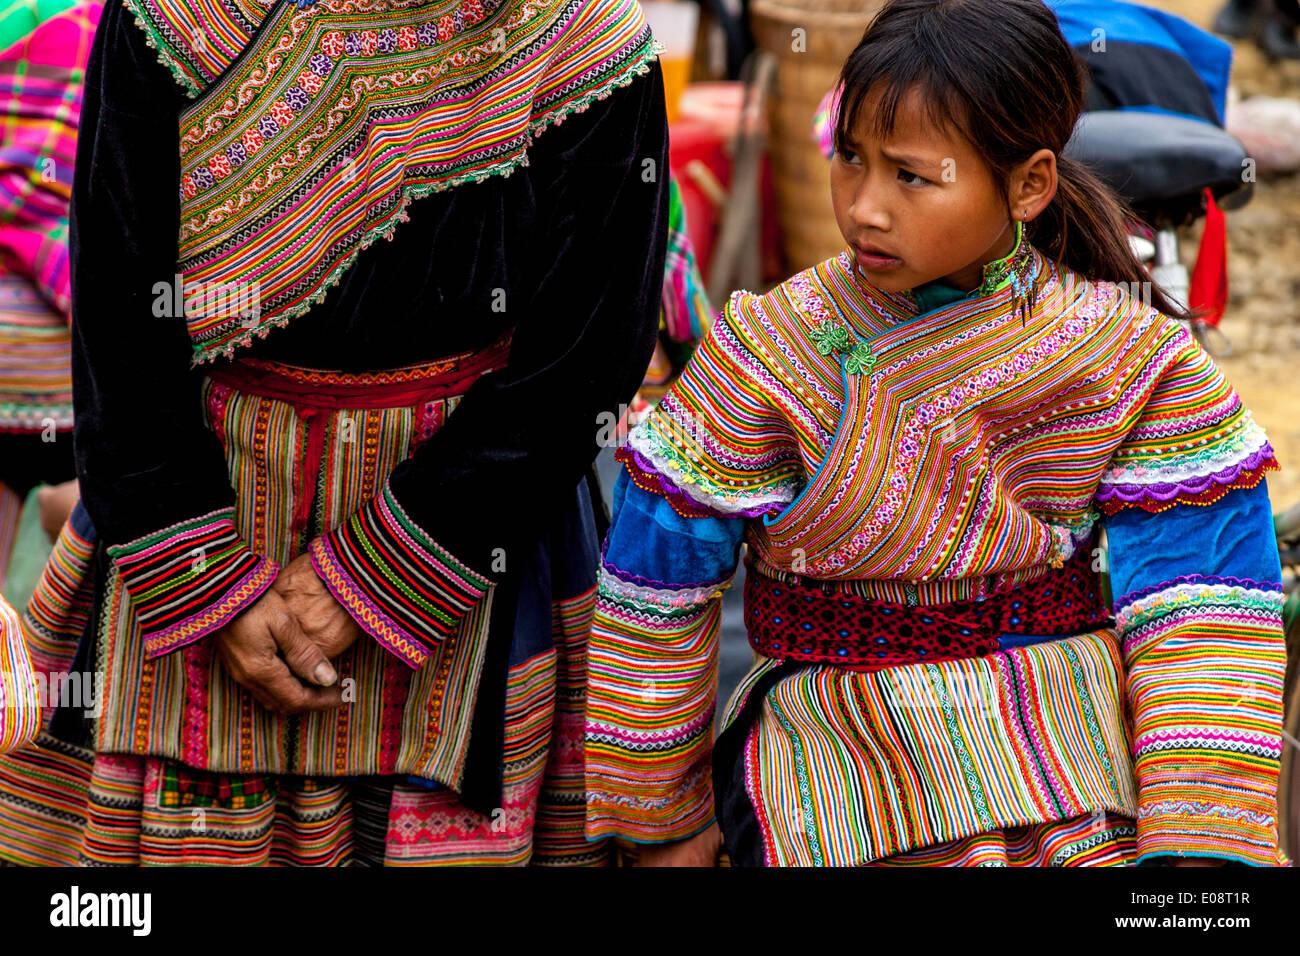 Un niño de la etnia Hmong de flores en el mercado dominical de Bac Ha, provincia de Lao Cai, Vietnam Imagen De Stock